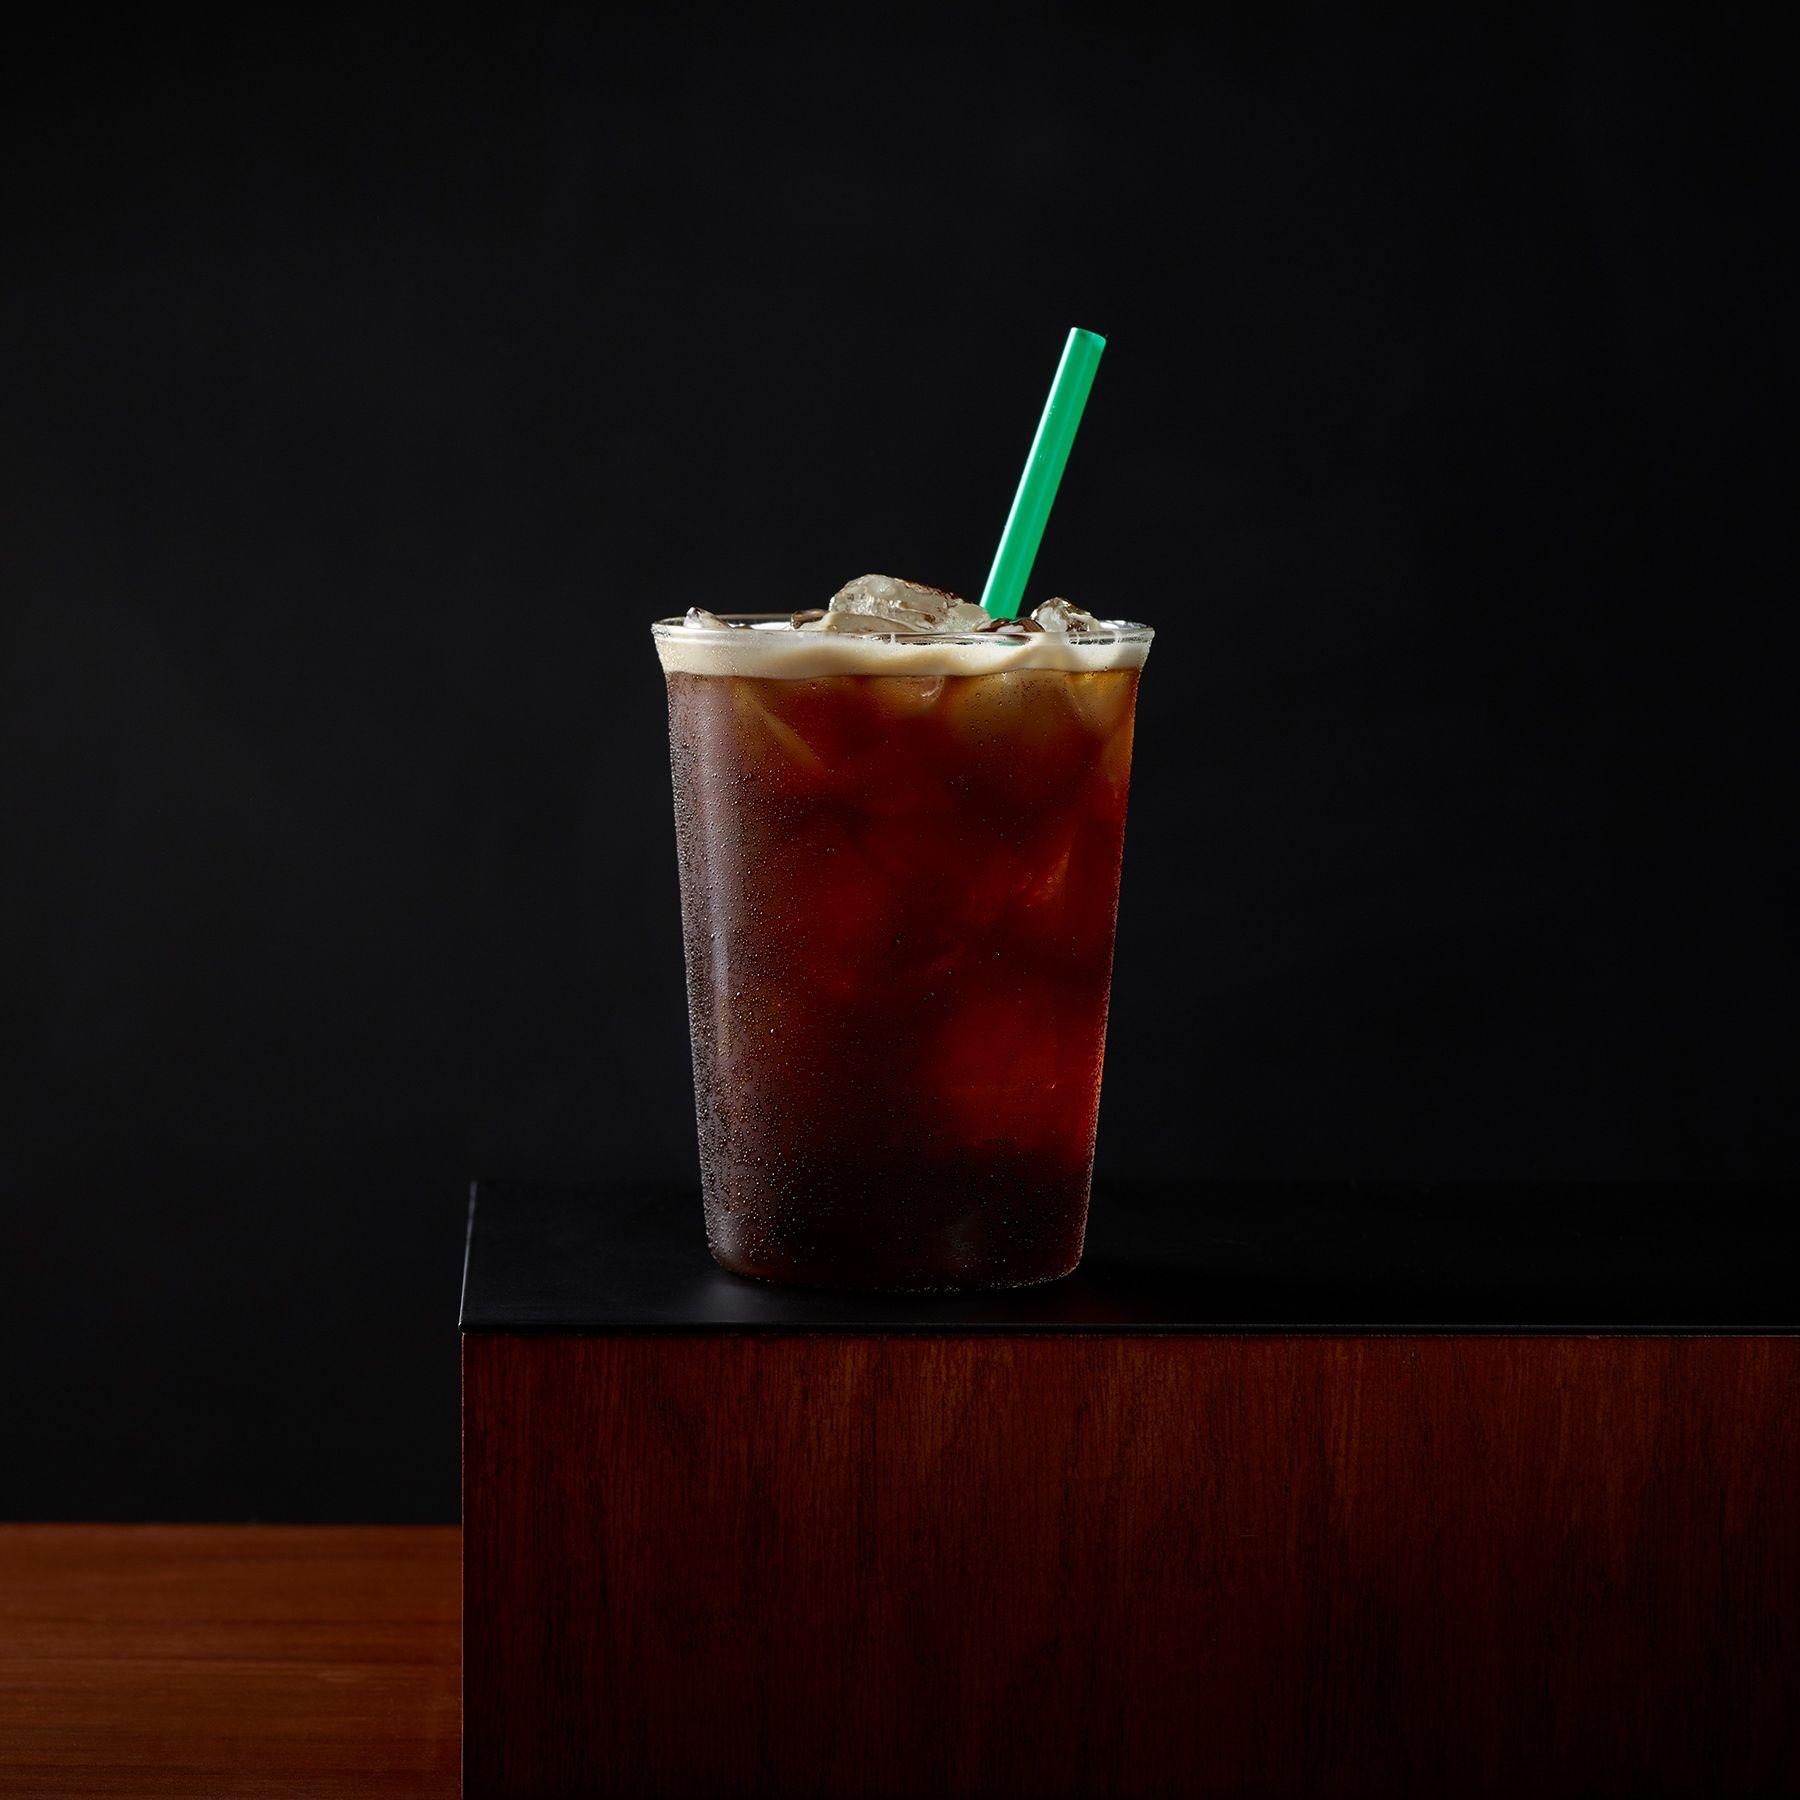 Iced Caffè Americano Starbucks Coffee Company